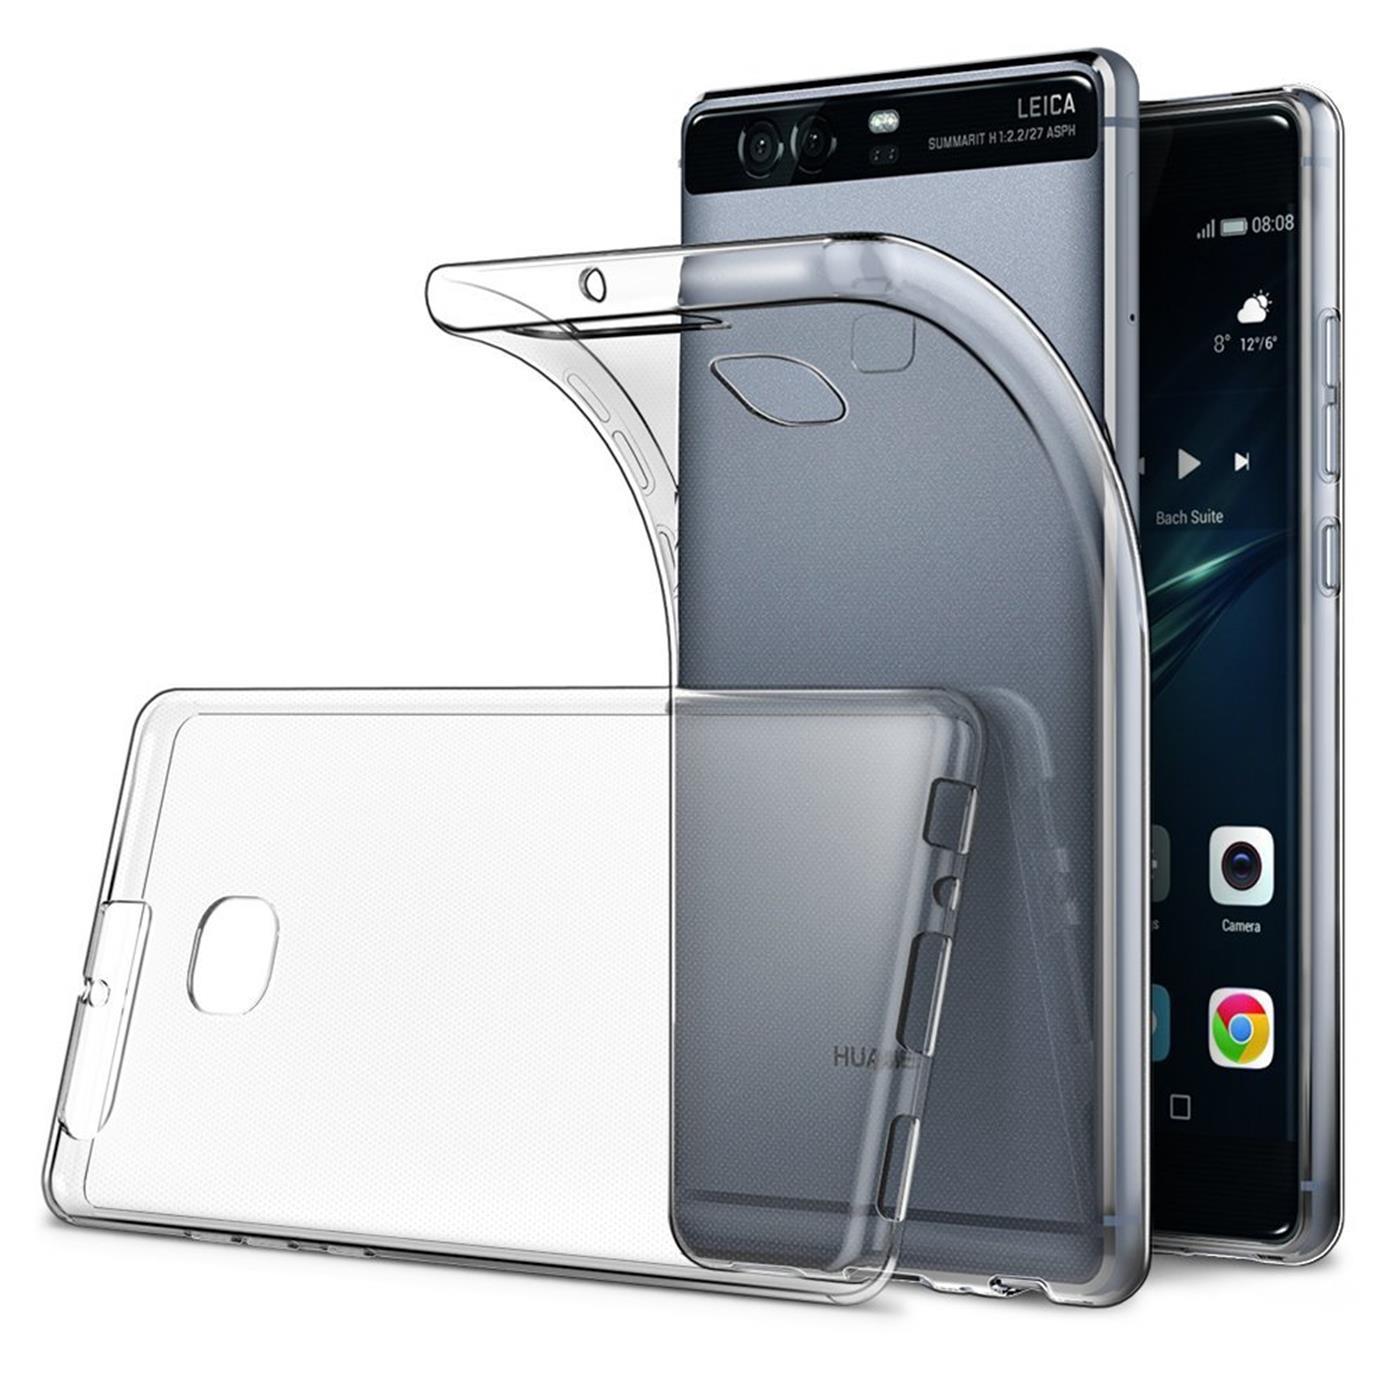 Huawei-p9-Duenn-Silikon-Klar-Case-Cover-Ultra-Slim-Stossfeste-Gel-Rueckseite Indexbild 3